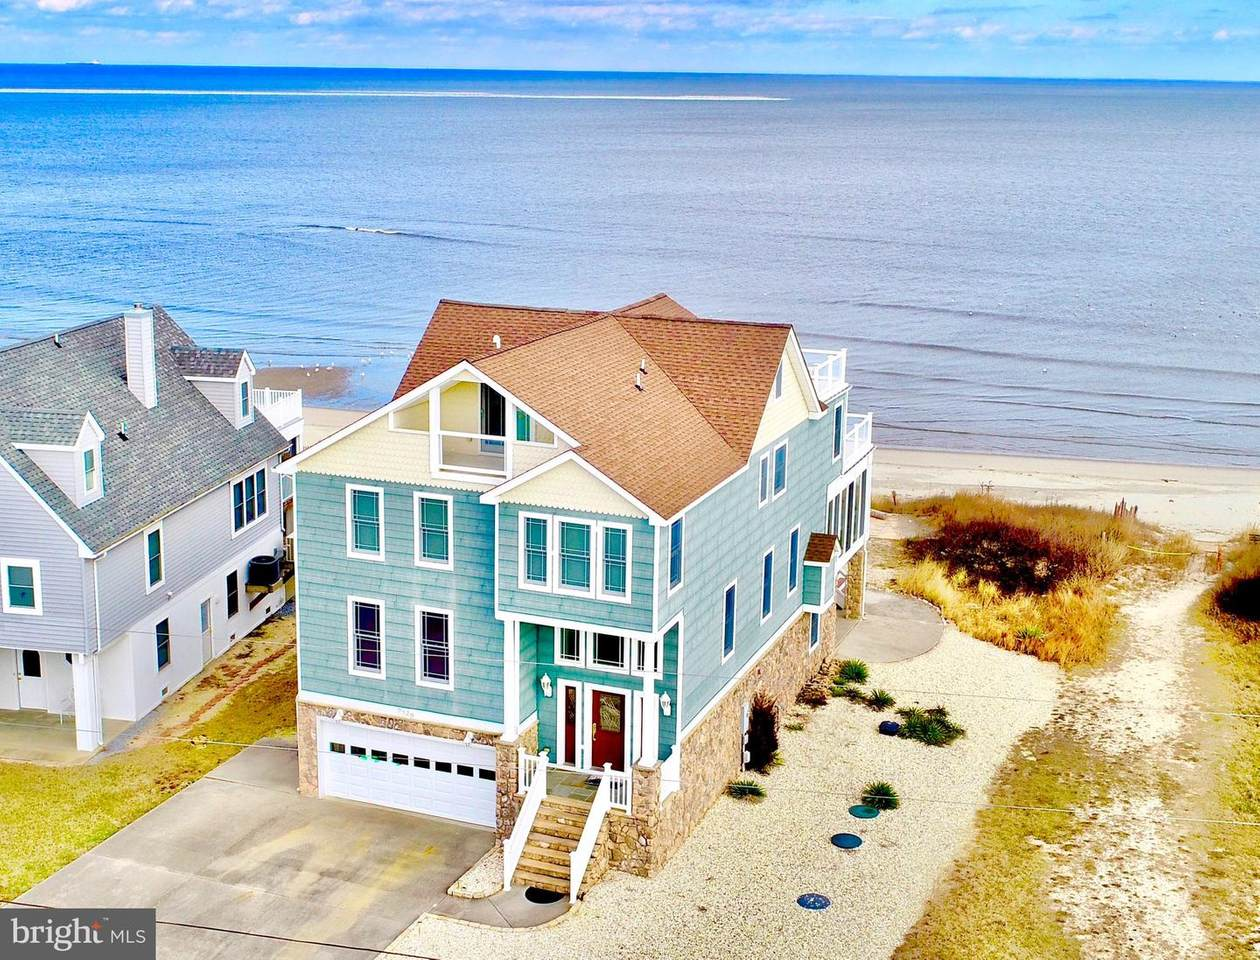 9829 Shore Drive - Photo 1